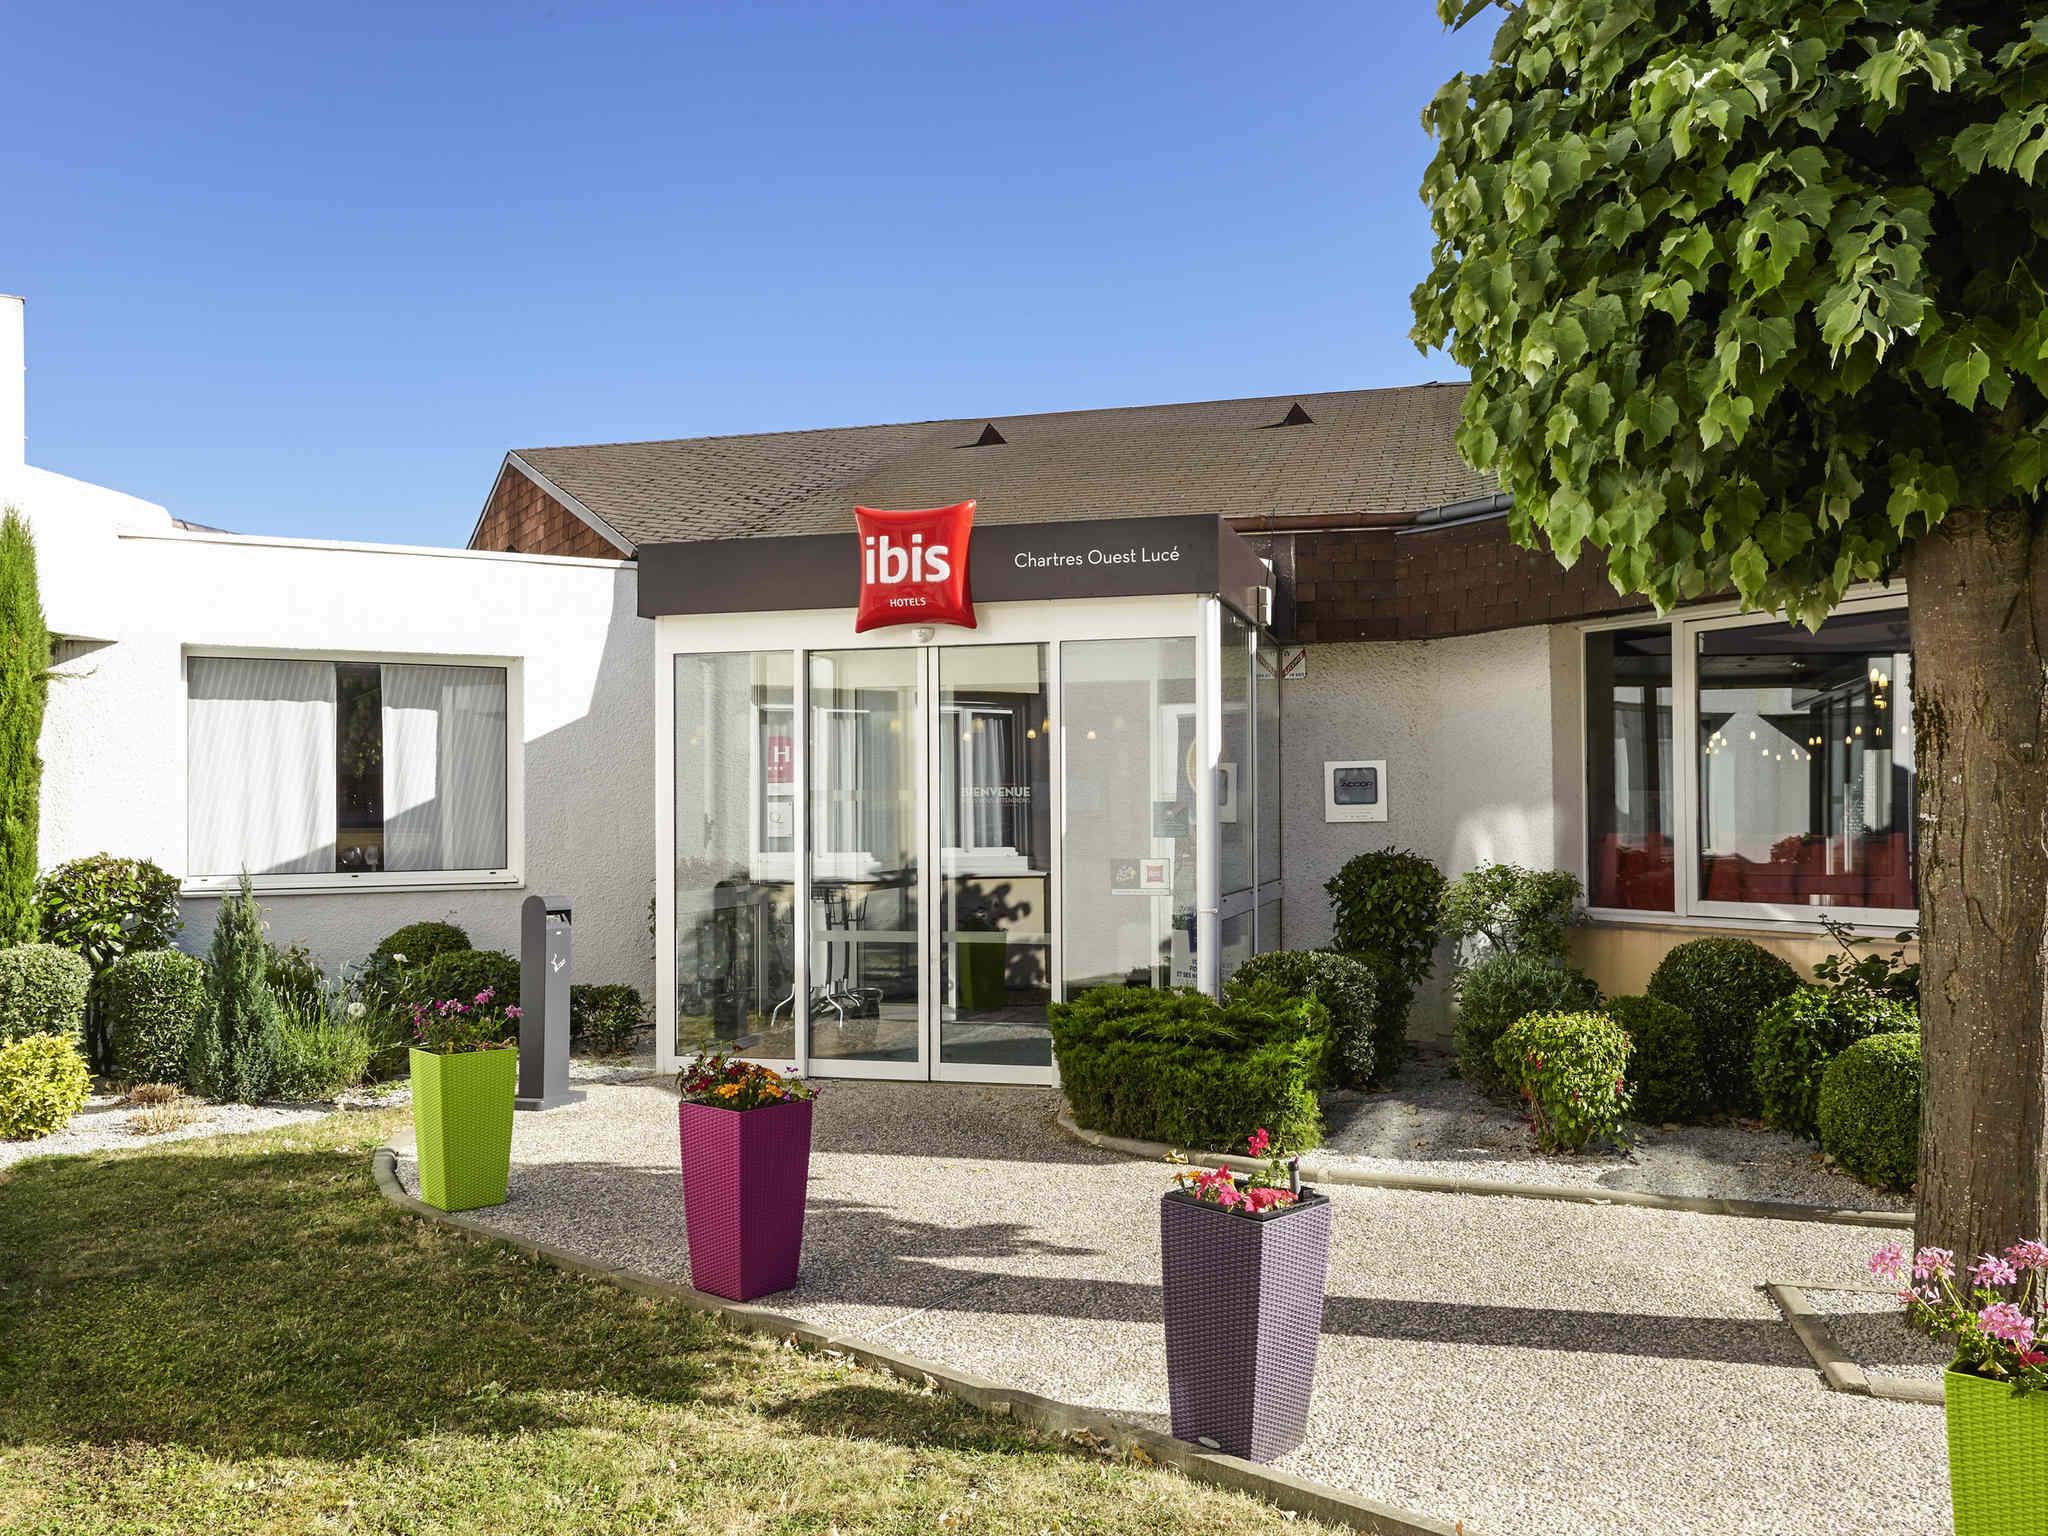 فندق - ibis Chartres Ouest Lucé